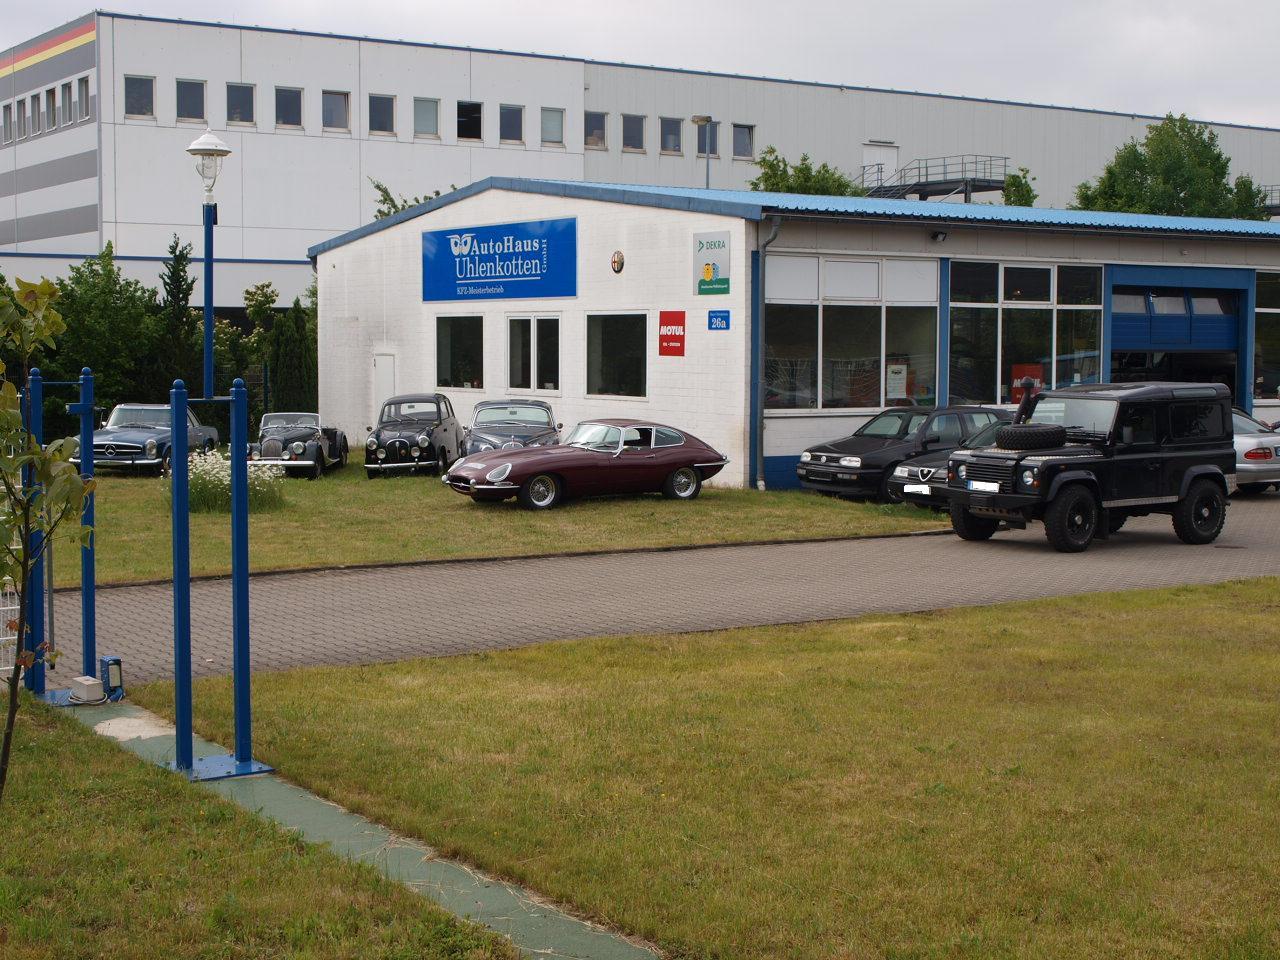 AutoHaus Uhlenkotten GmbH, Haus Uhlenkotten in Münster